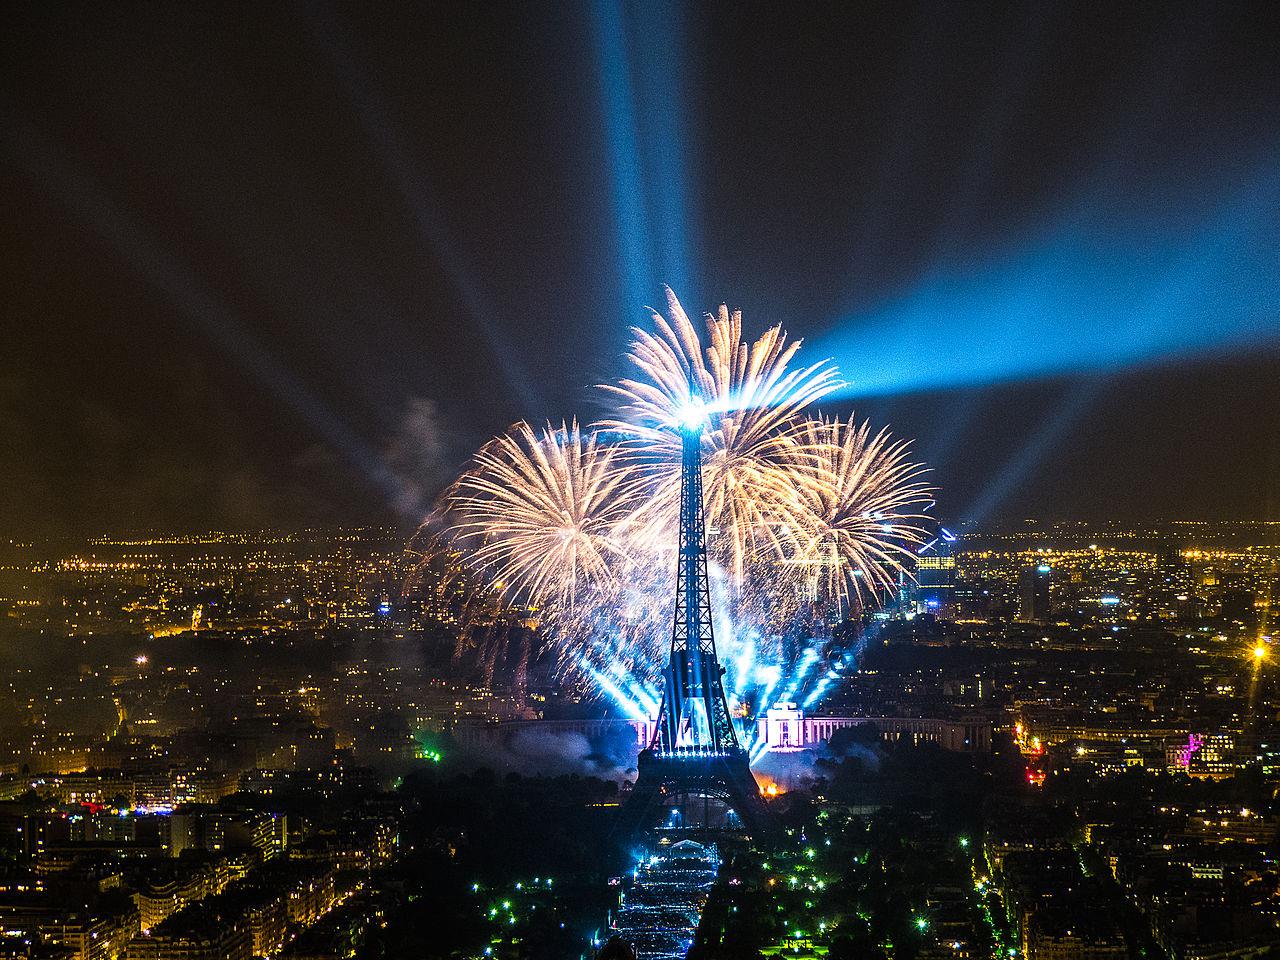 1280px-2013_Fireworks_on_Eiffel_Tower_11